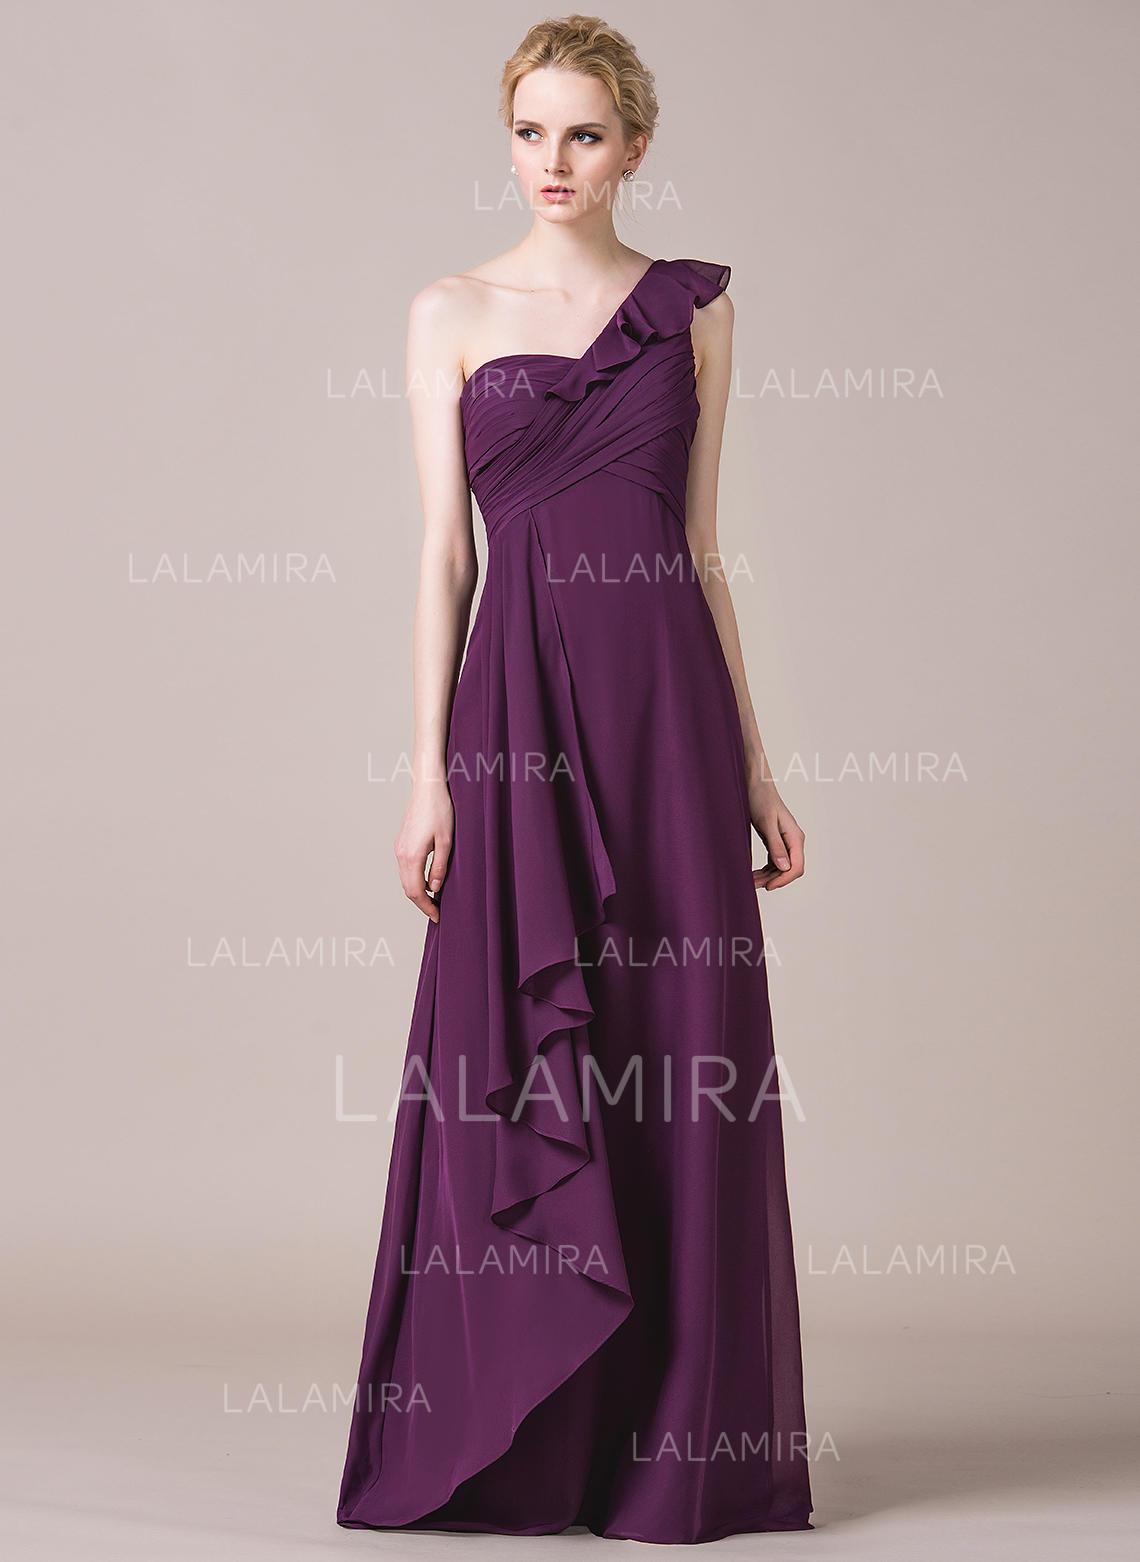 6c20c623e5ed5 A-Line/Princess Chiffon Bridesmaid Dresses Cascading Ruffles One-Shoulder  Sleeveless Floor-. Loading zoom